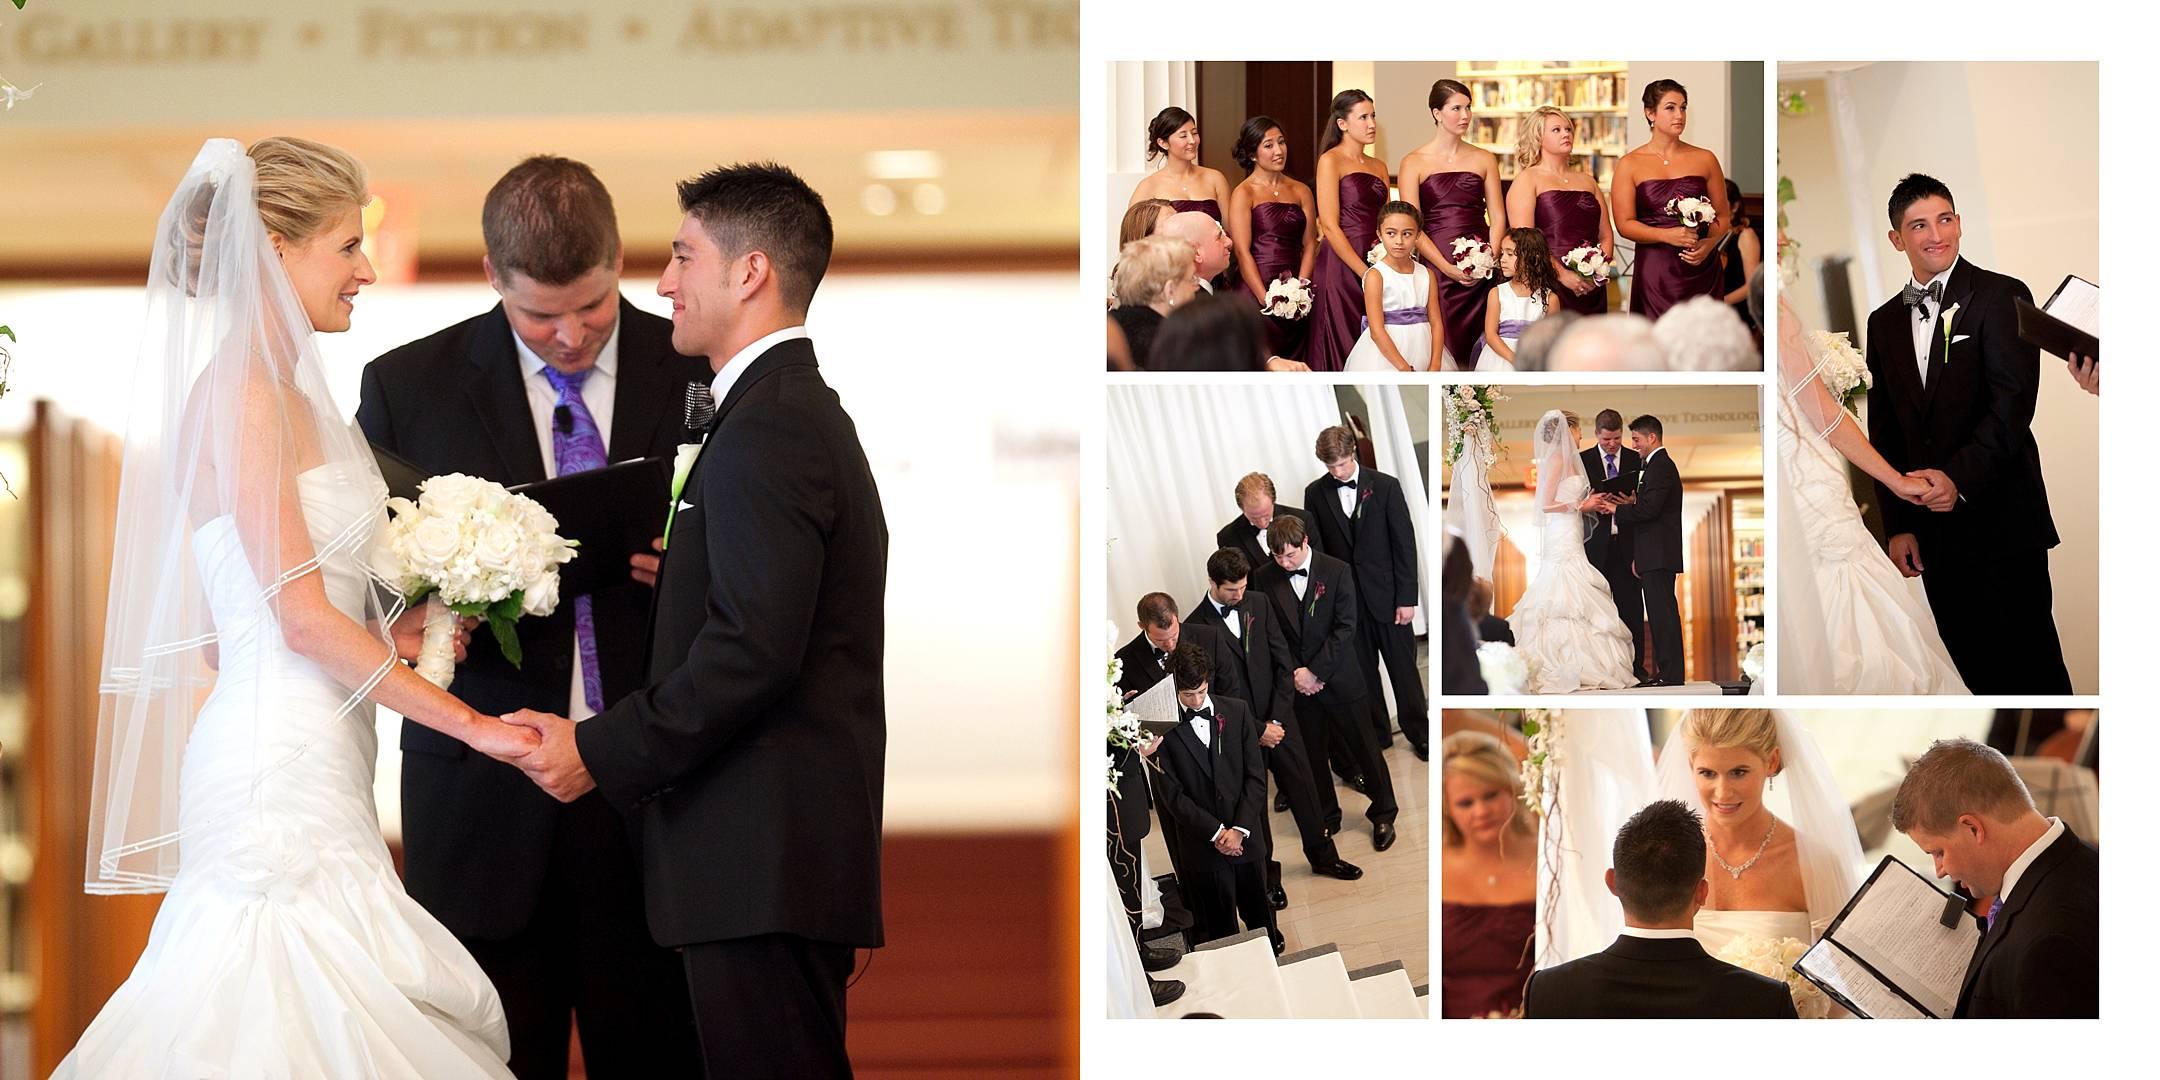 schmidt-photo-wedding-photography-chicago_2300